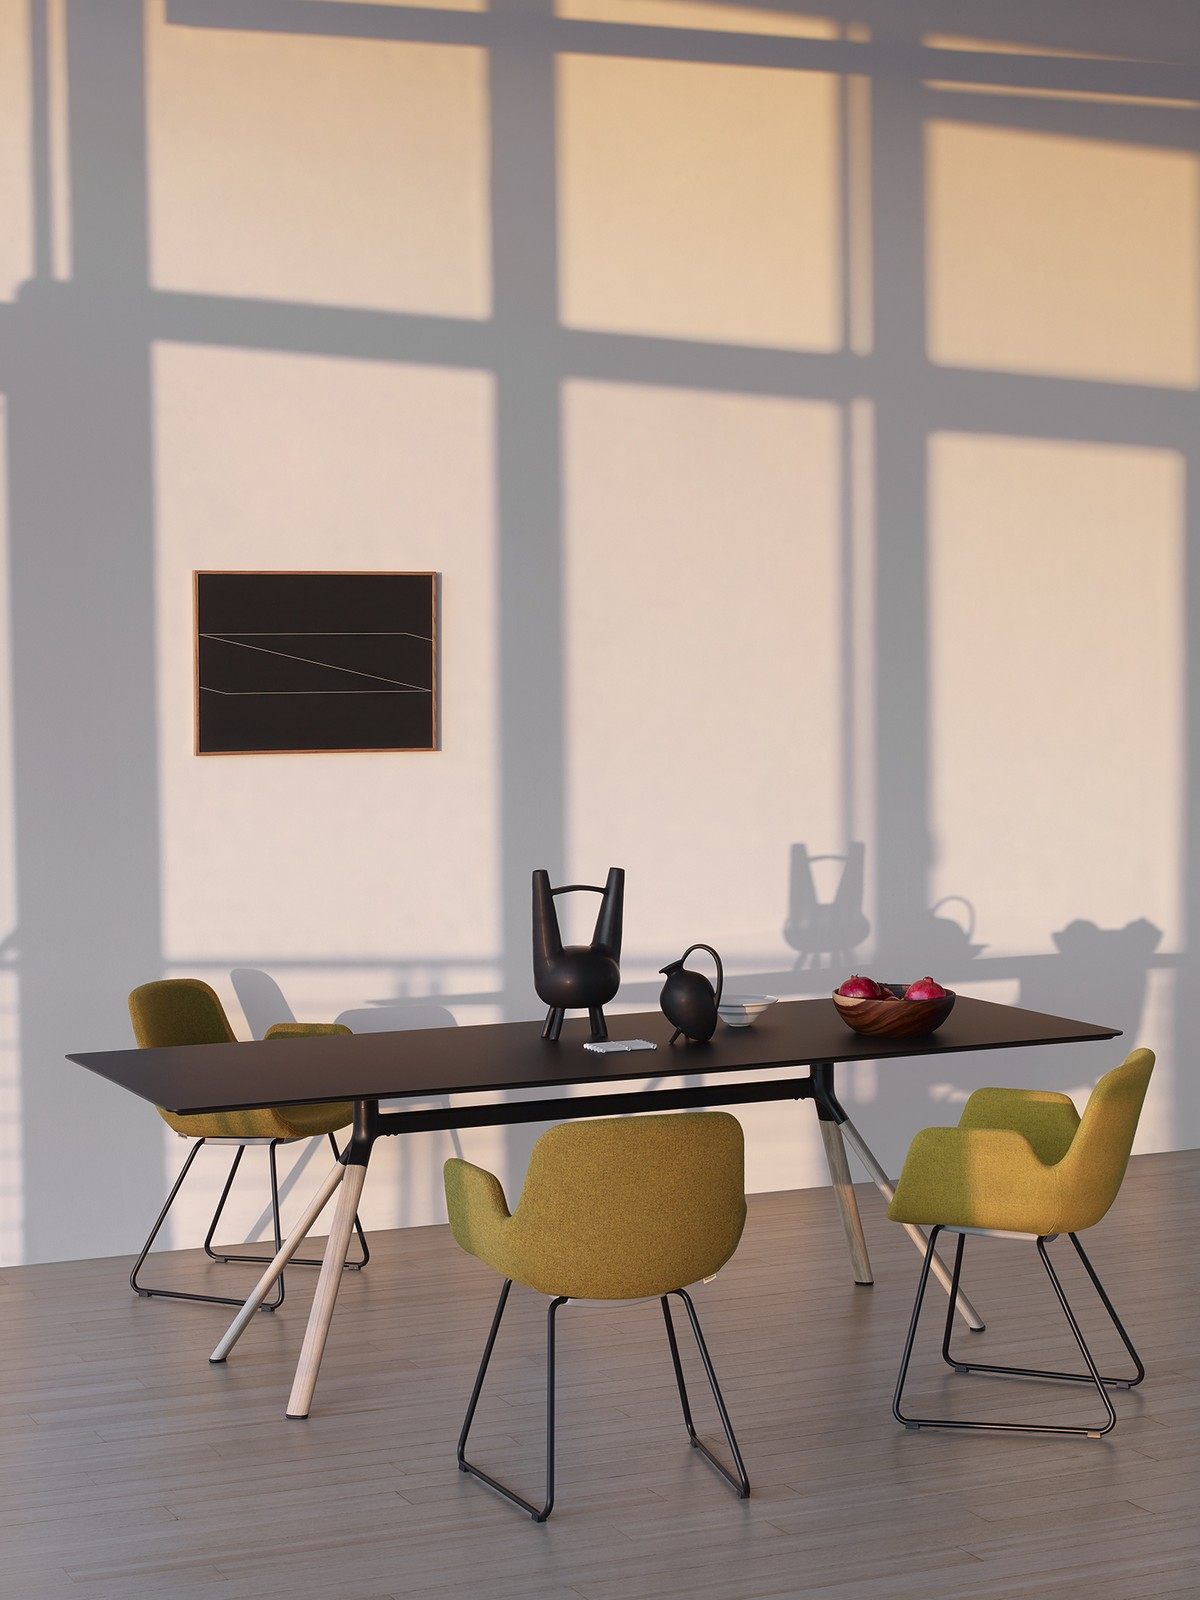 lapalma novit design 2019 pezzi iconici sedia. Black Bedroom Furniture Sets. Home Design Ideas